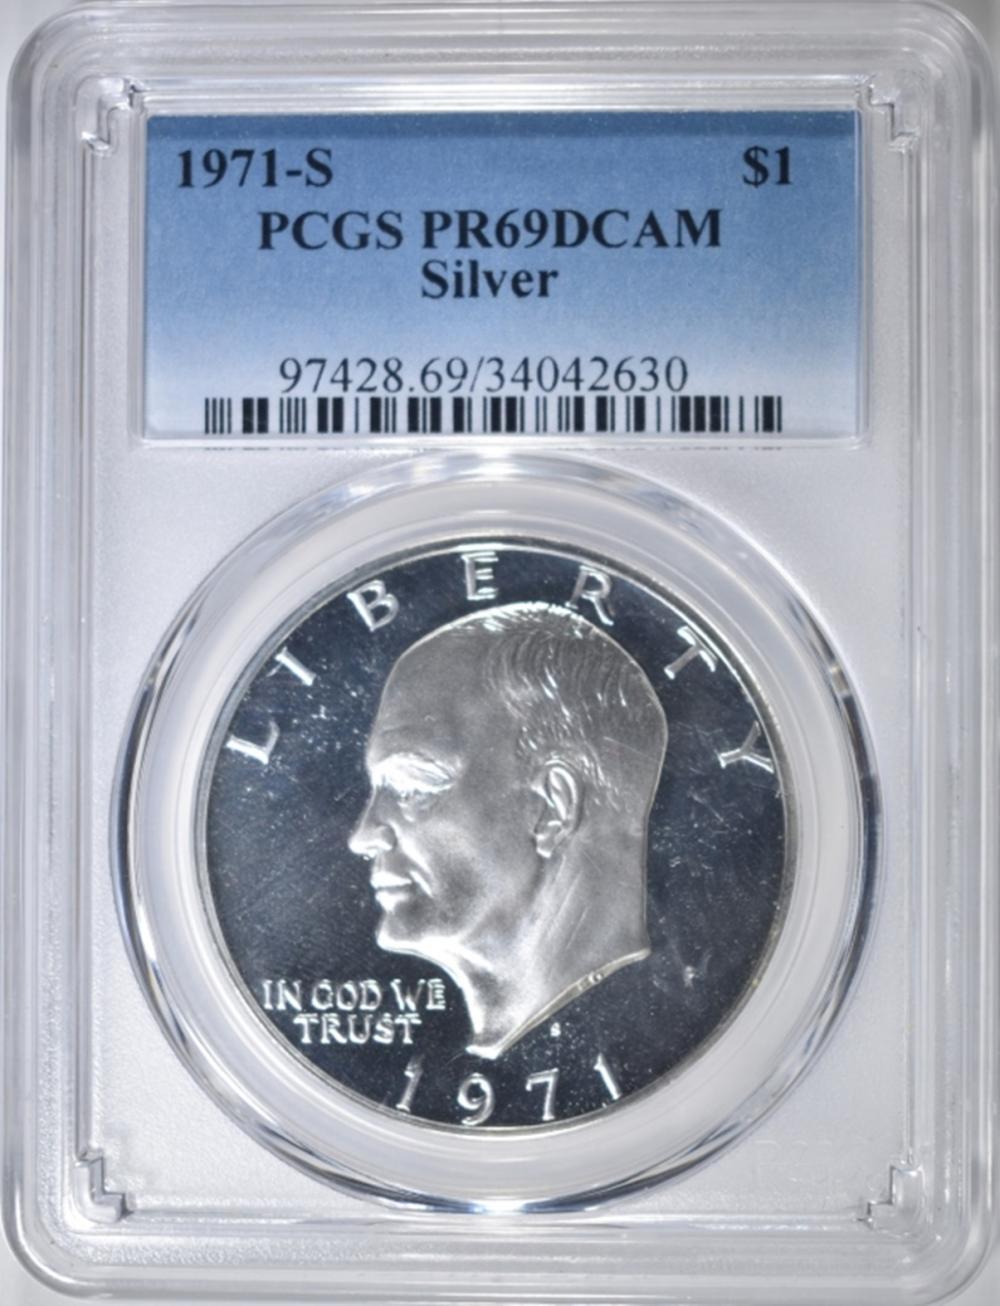 1971-S EISENHOWER SILVER DOLLAR  PCGS PR69DCAM